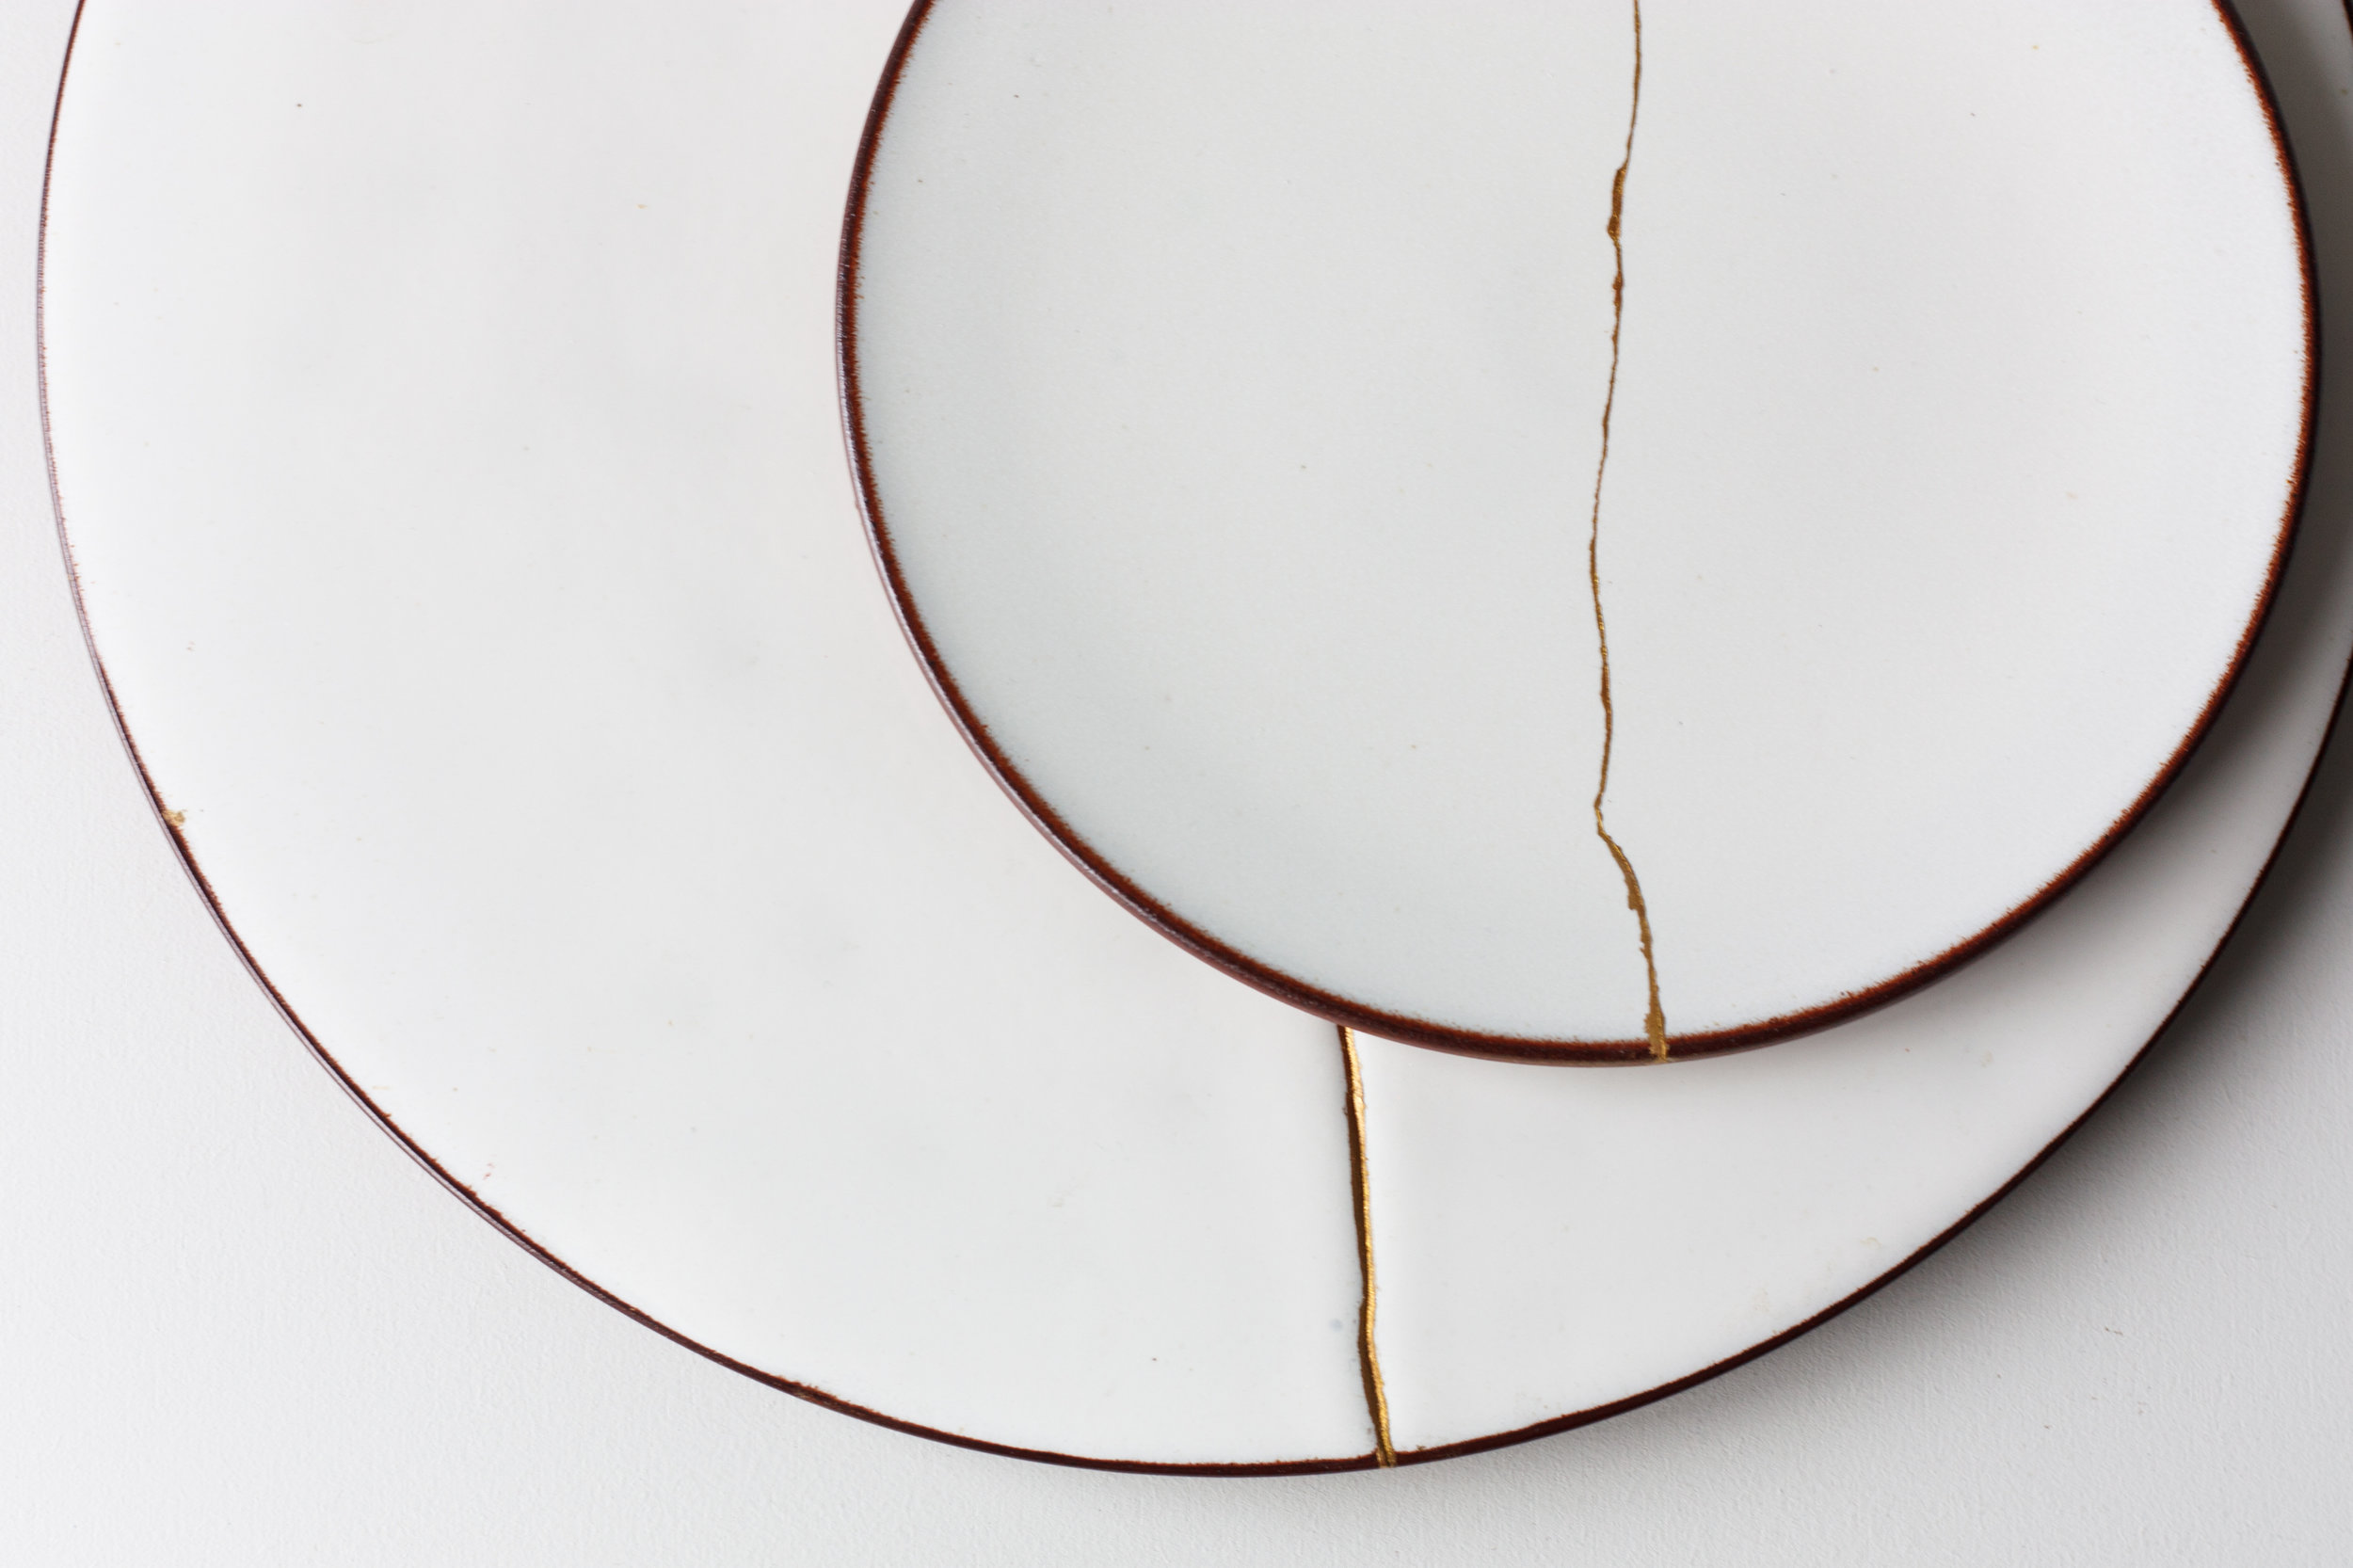 kintsugi-terracotta-plates-reiko-kaneko-ceramics-london-design-festival-2016-ldf16-all-that-is-broken-is-not-lost-studio-glaze-fine-bone-china_-4_29478292335_o.jpg